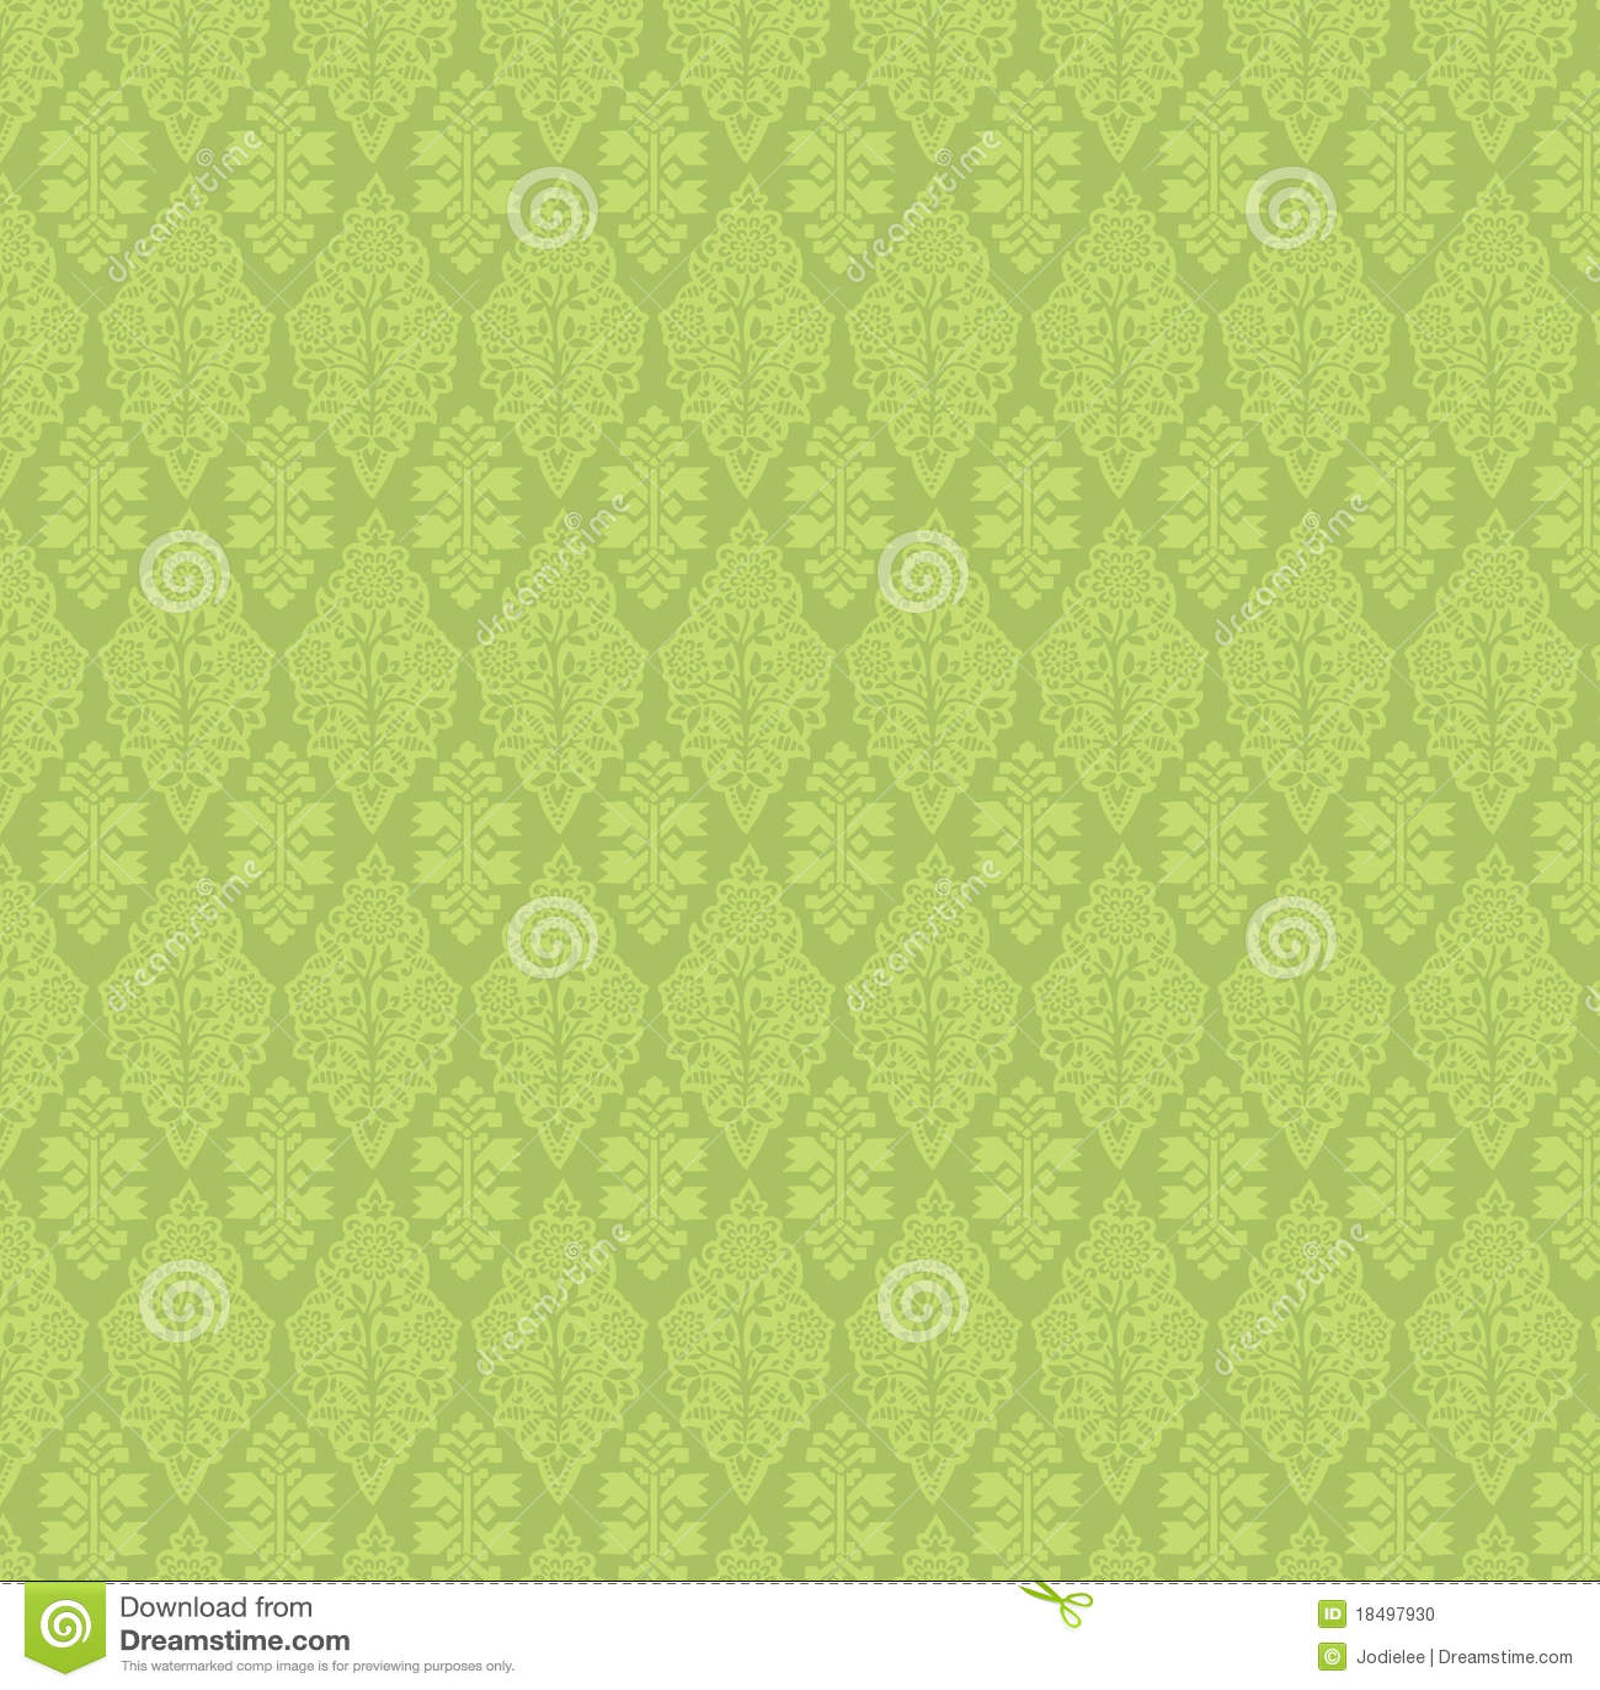 green vintage wallpaper - photo #38